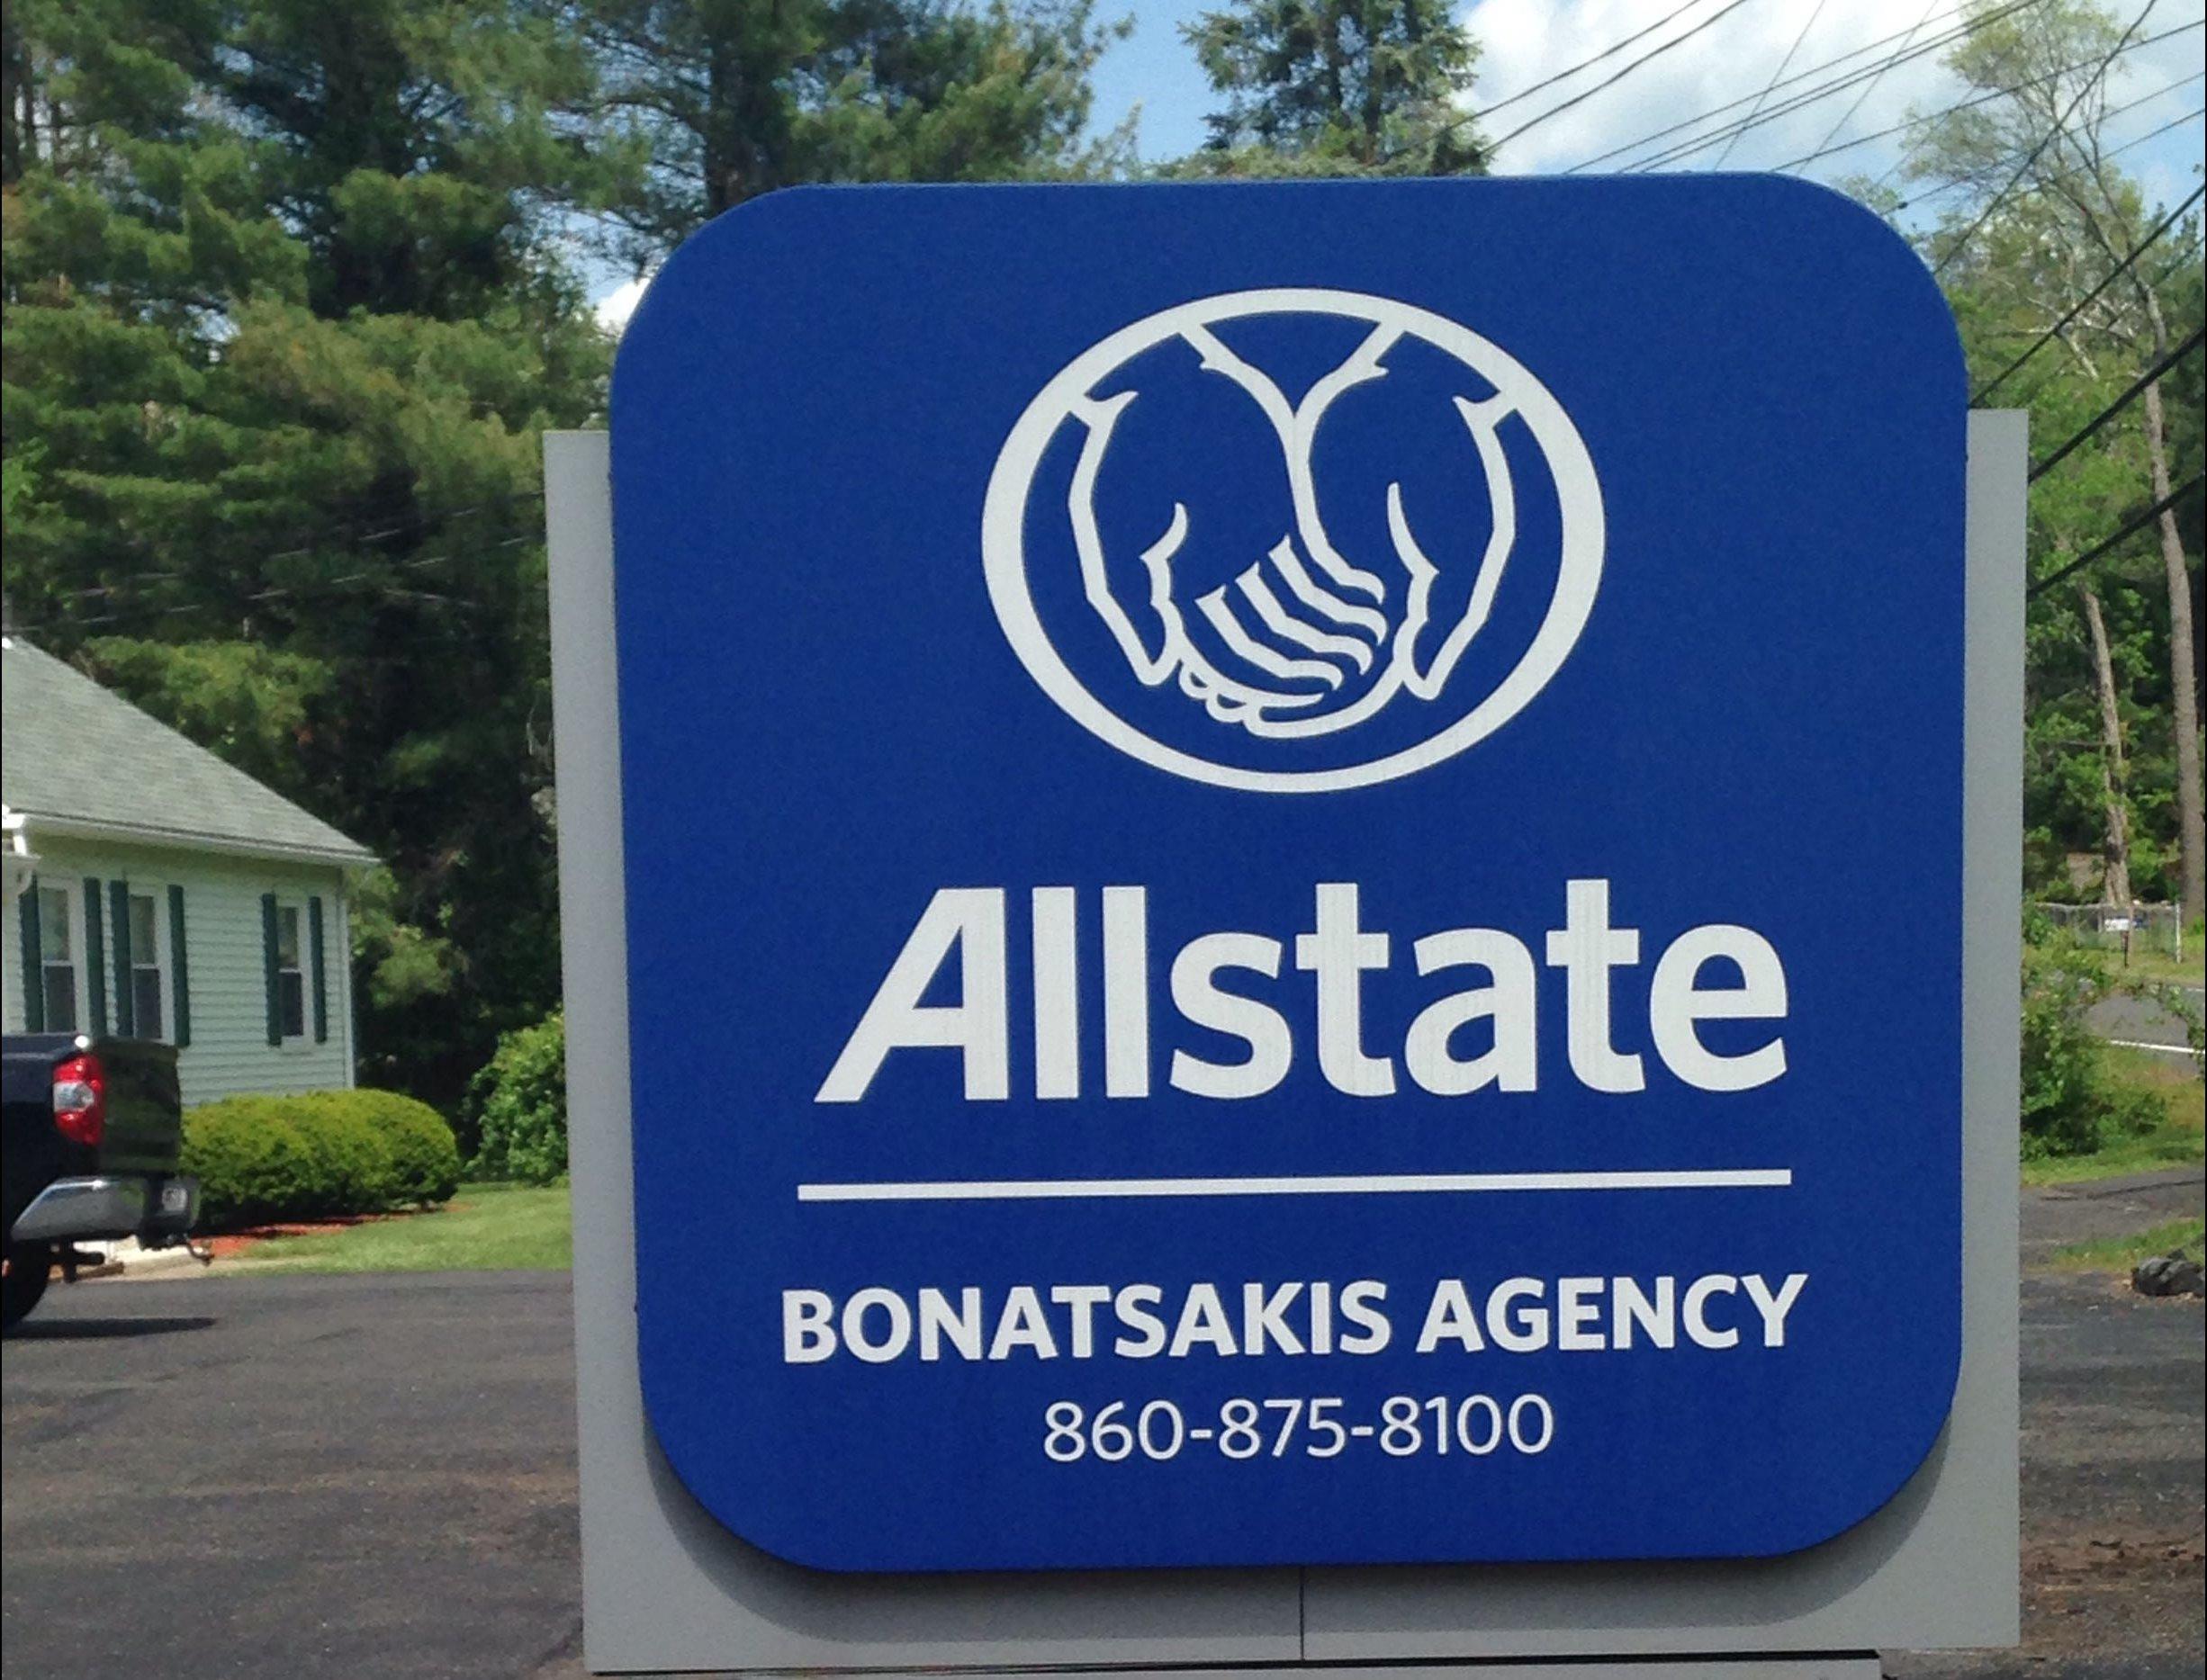 Mike Bonatsakis: Allstate Insurance image 2